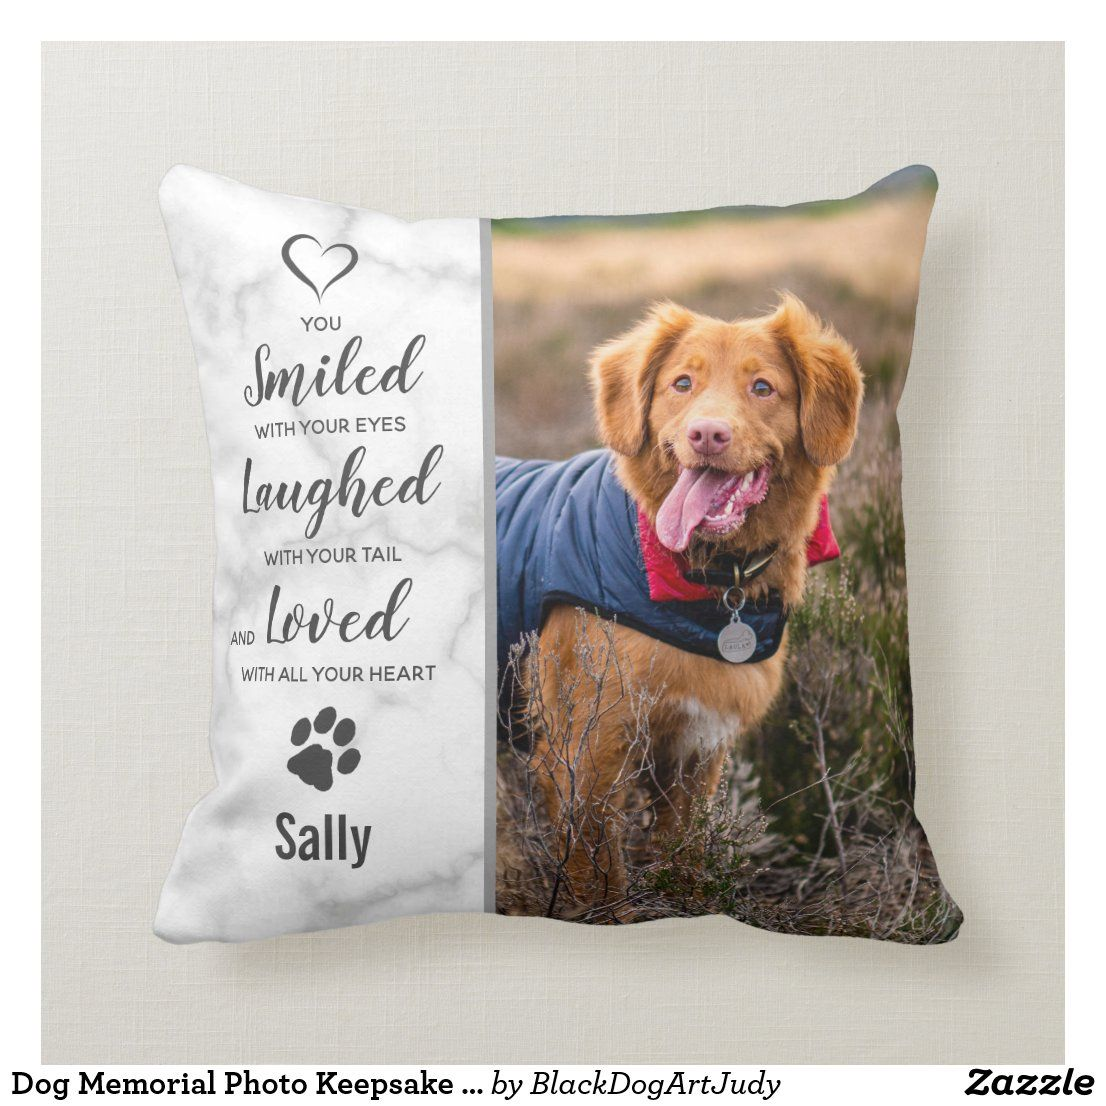 Dog memorial photo keepsake sympathy pet loss throw